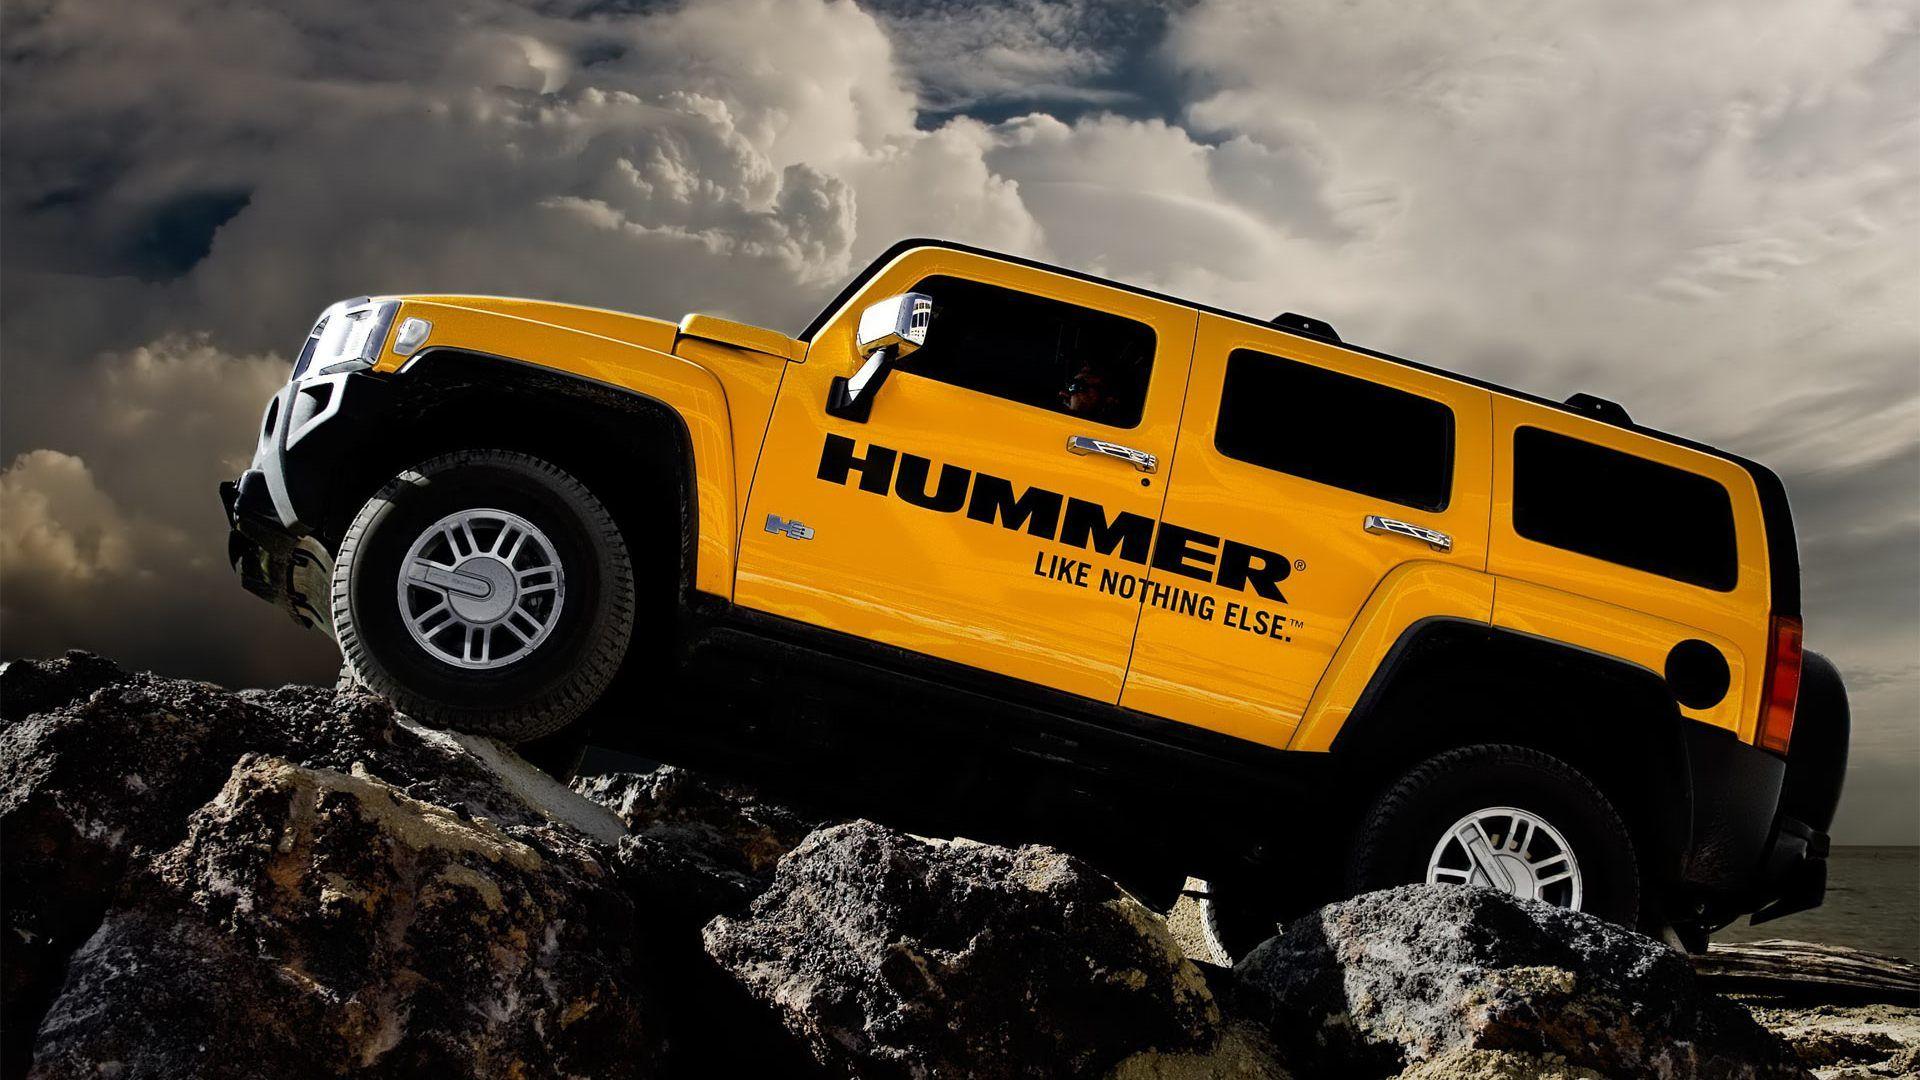 Hd wallpaper car - Hummer Nothing Wallpaper Car Cars Cars Hd Wallpaper 1920x1080 Px